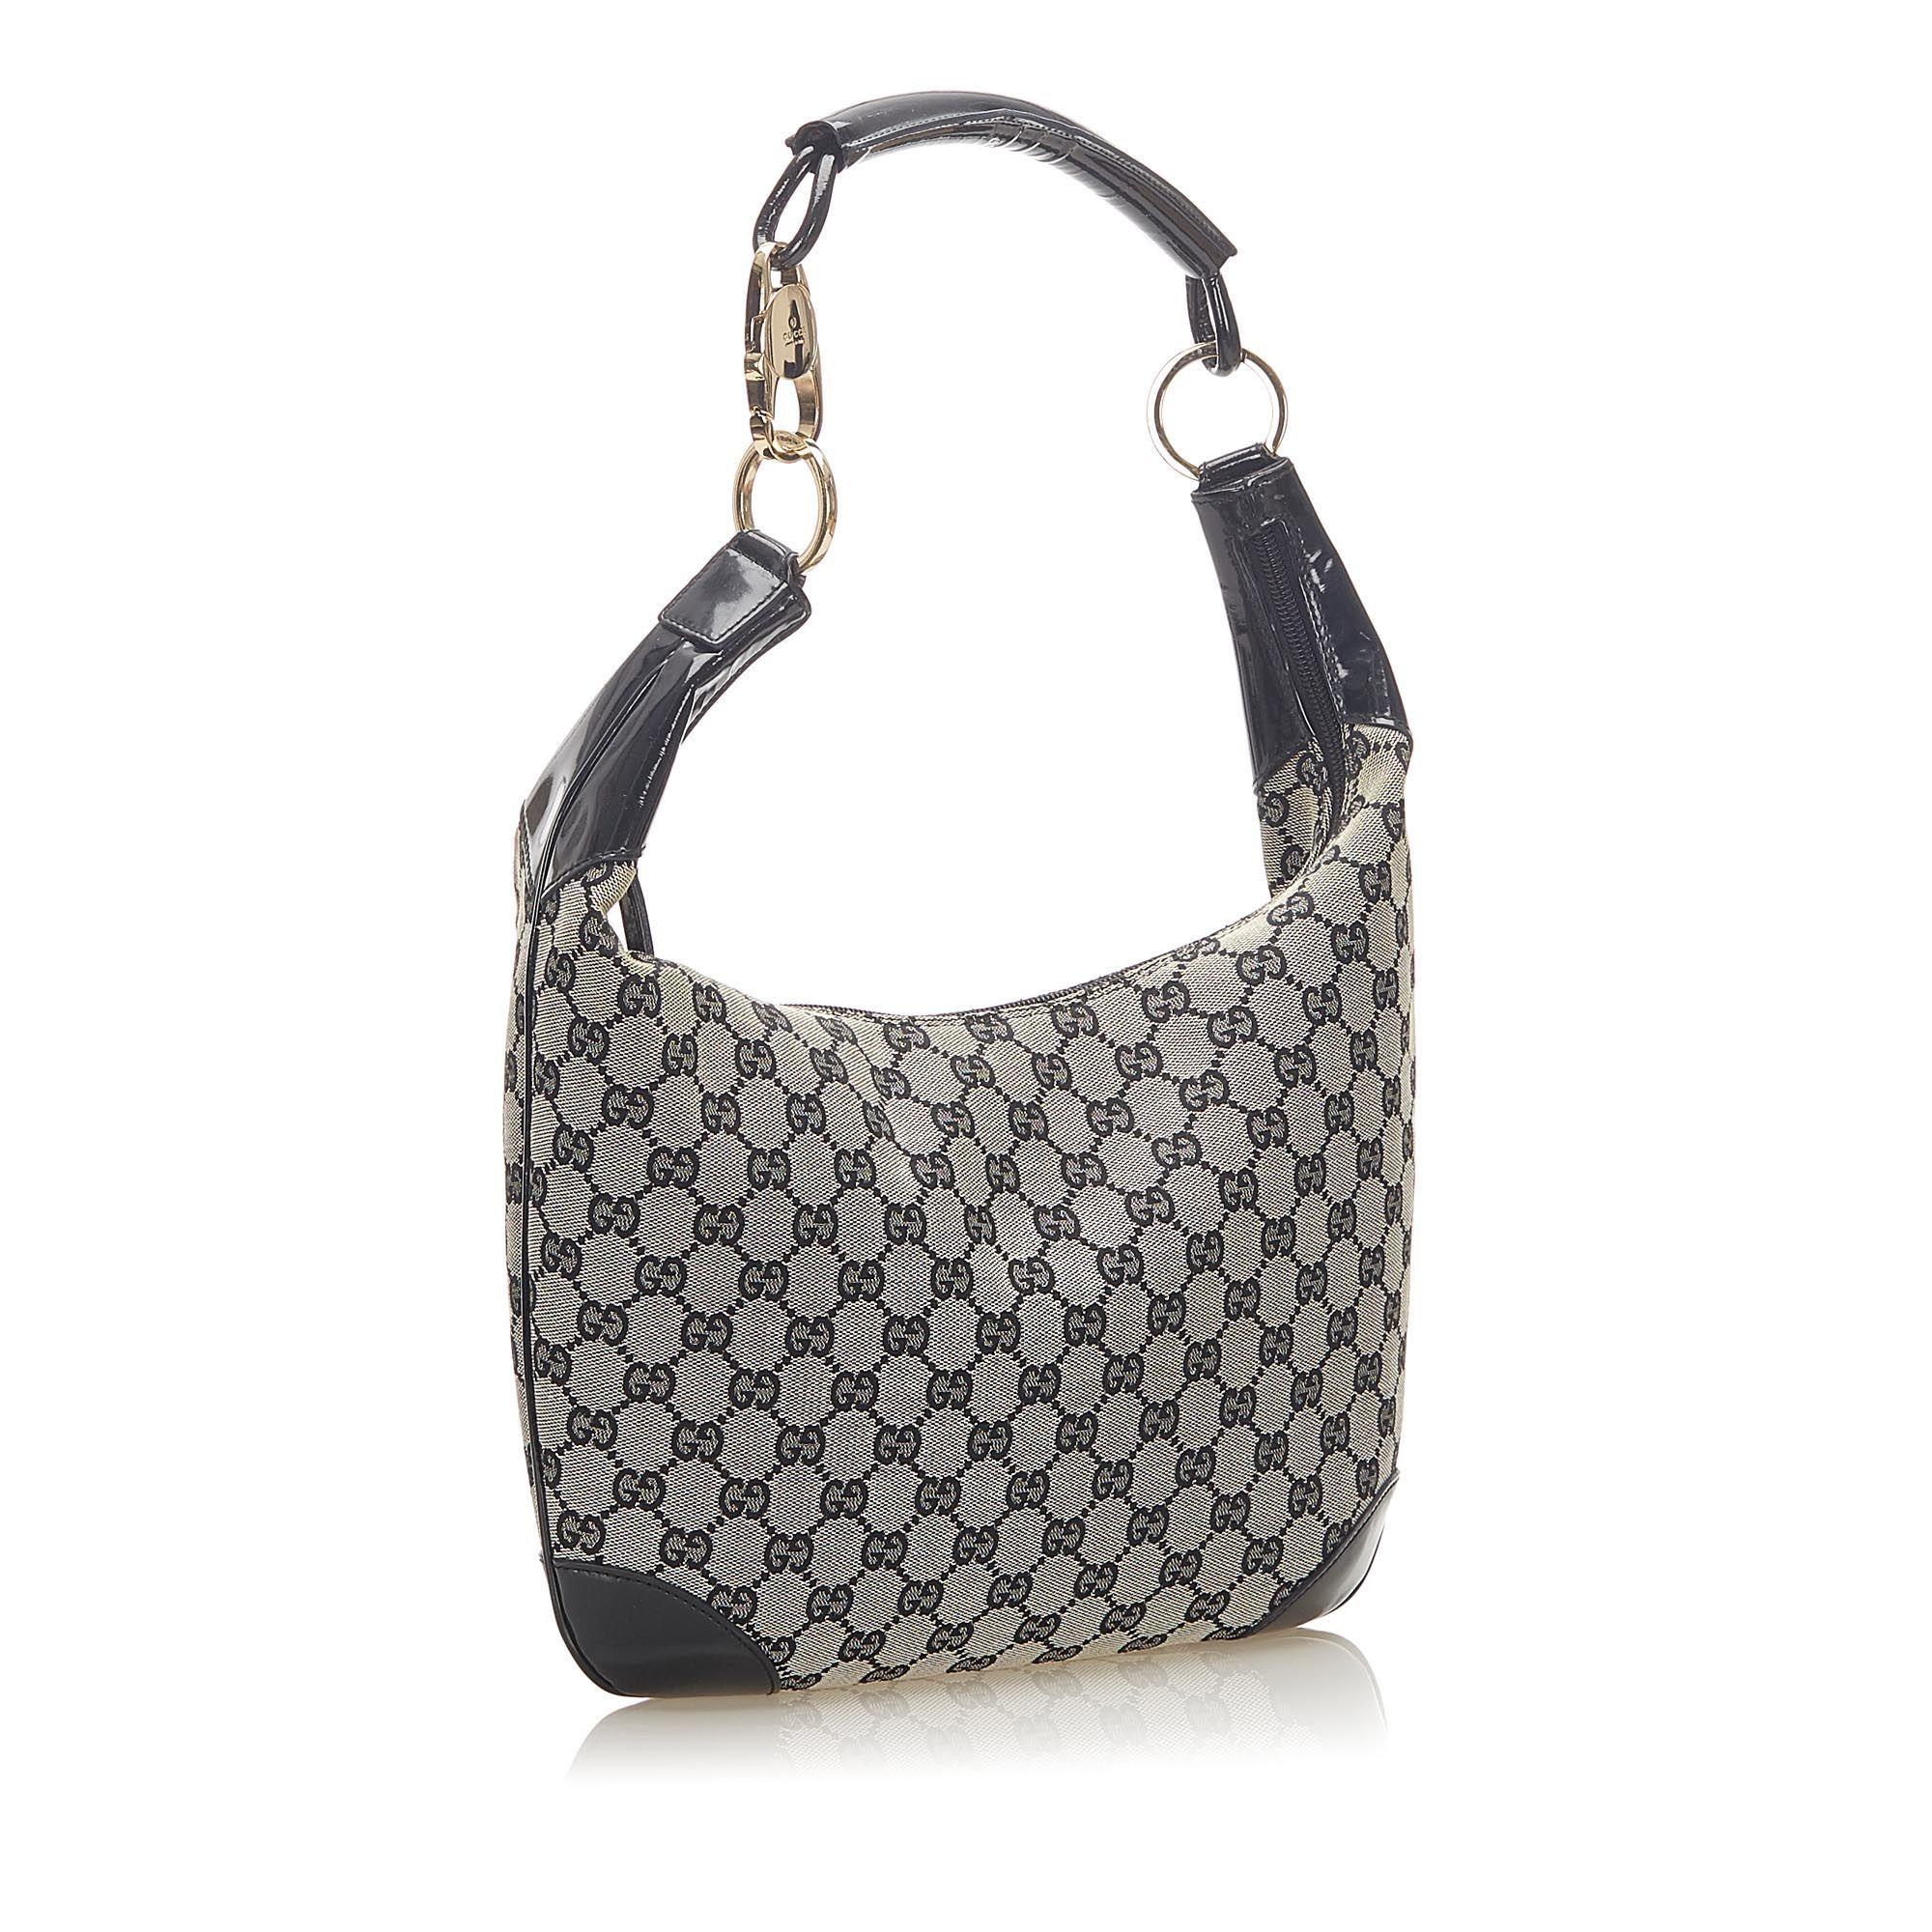 Vintage Gucci GG Canvas Shoulder Bag Gray